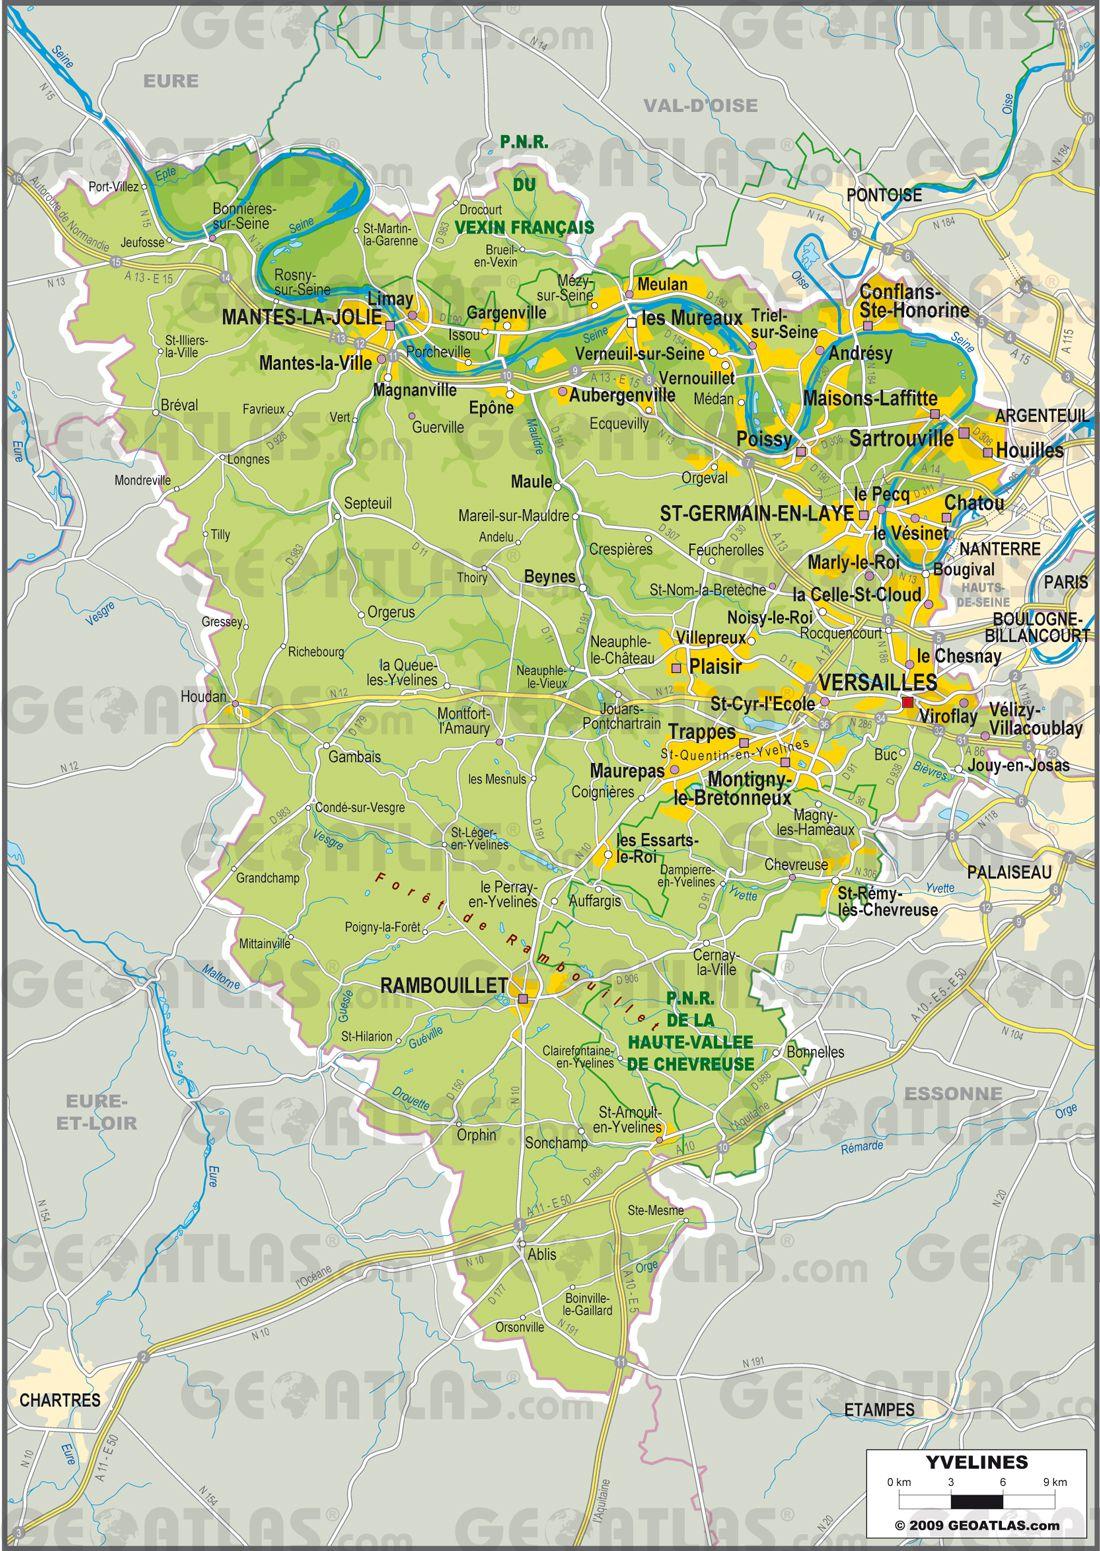 Yvelines cartes